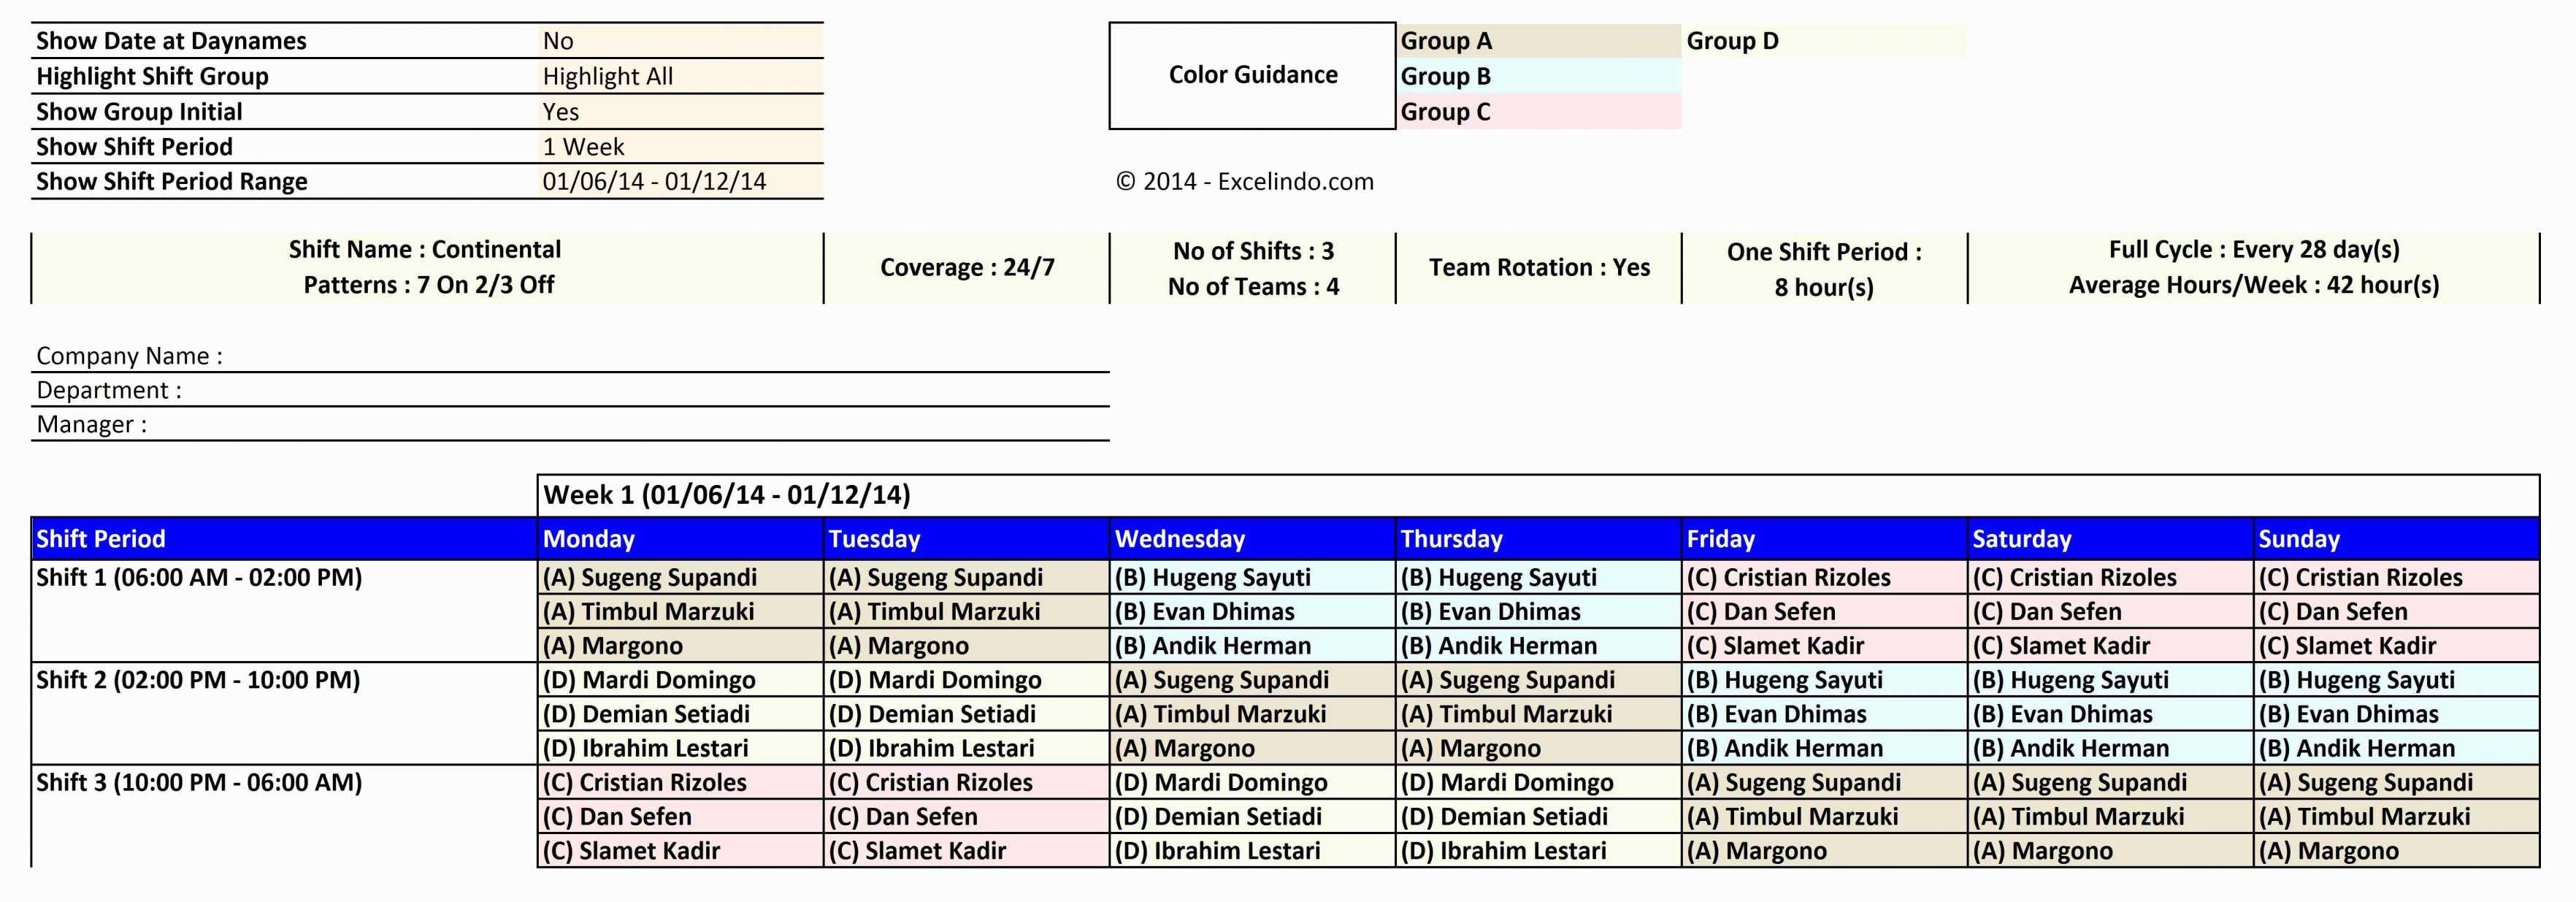 Project Management Spreadsheet Google Docs Project Management Google and Project Tracking Spreadsheet